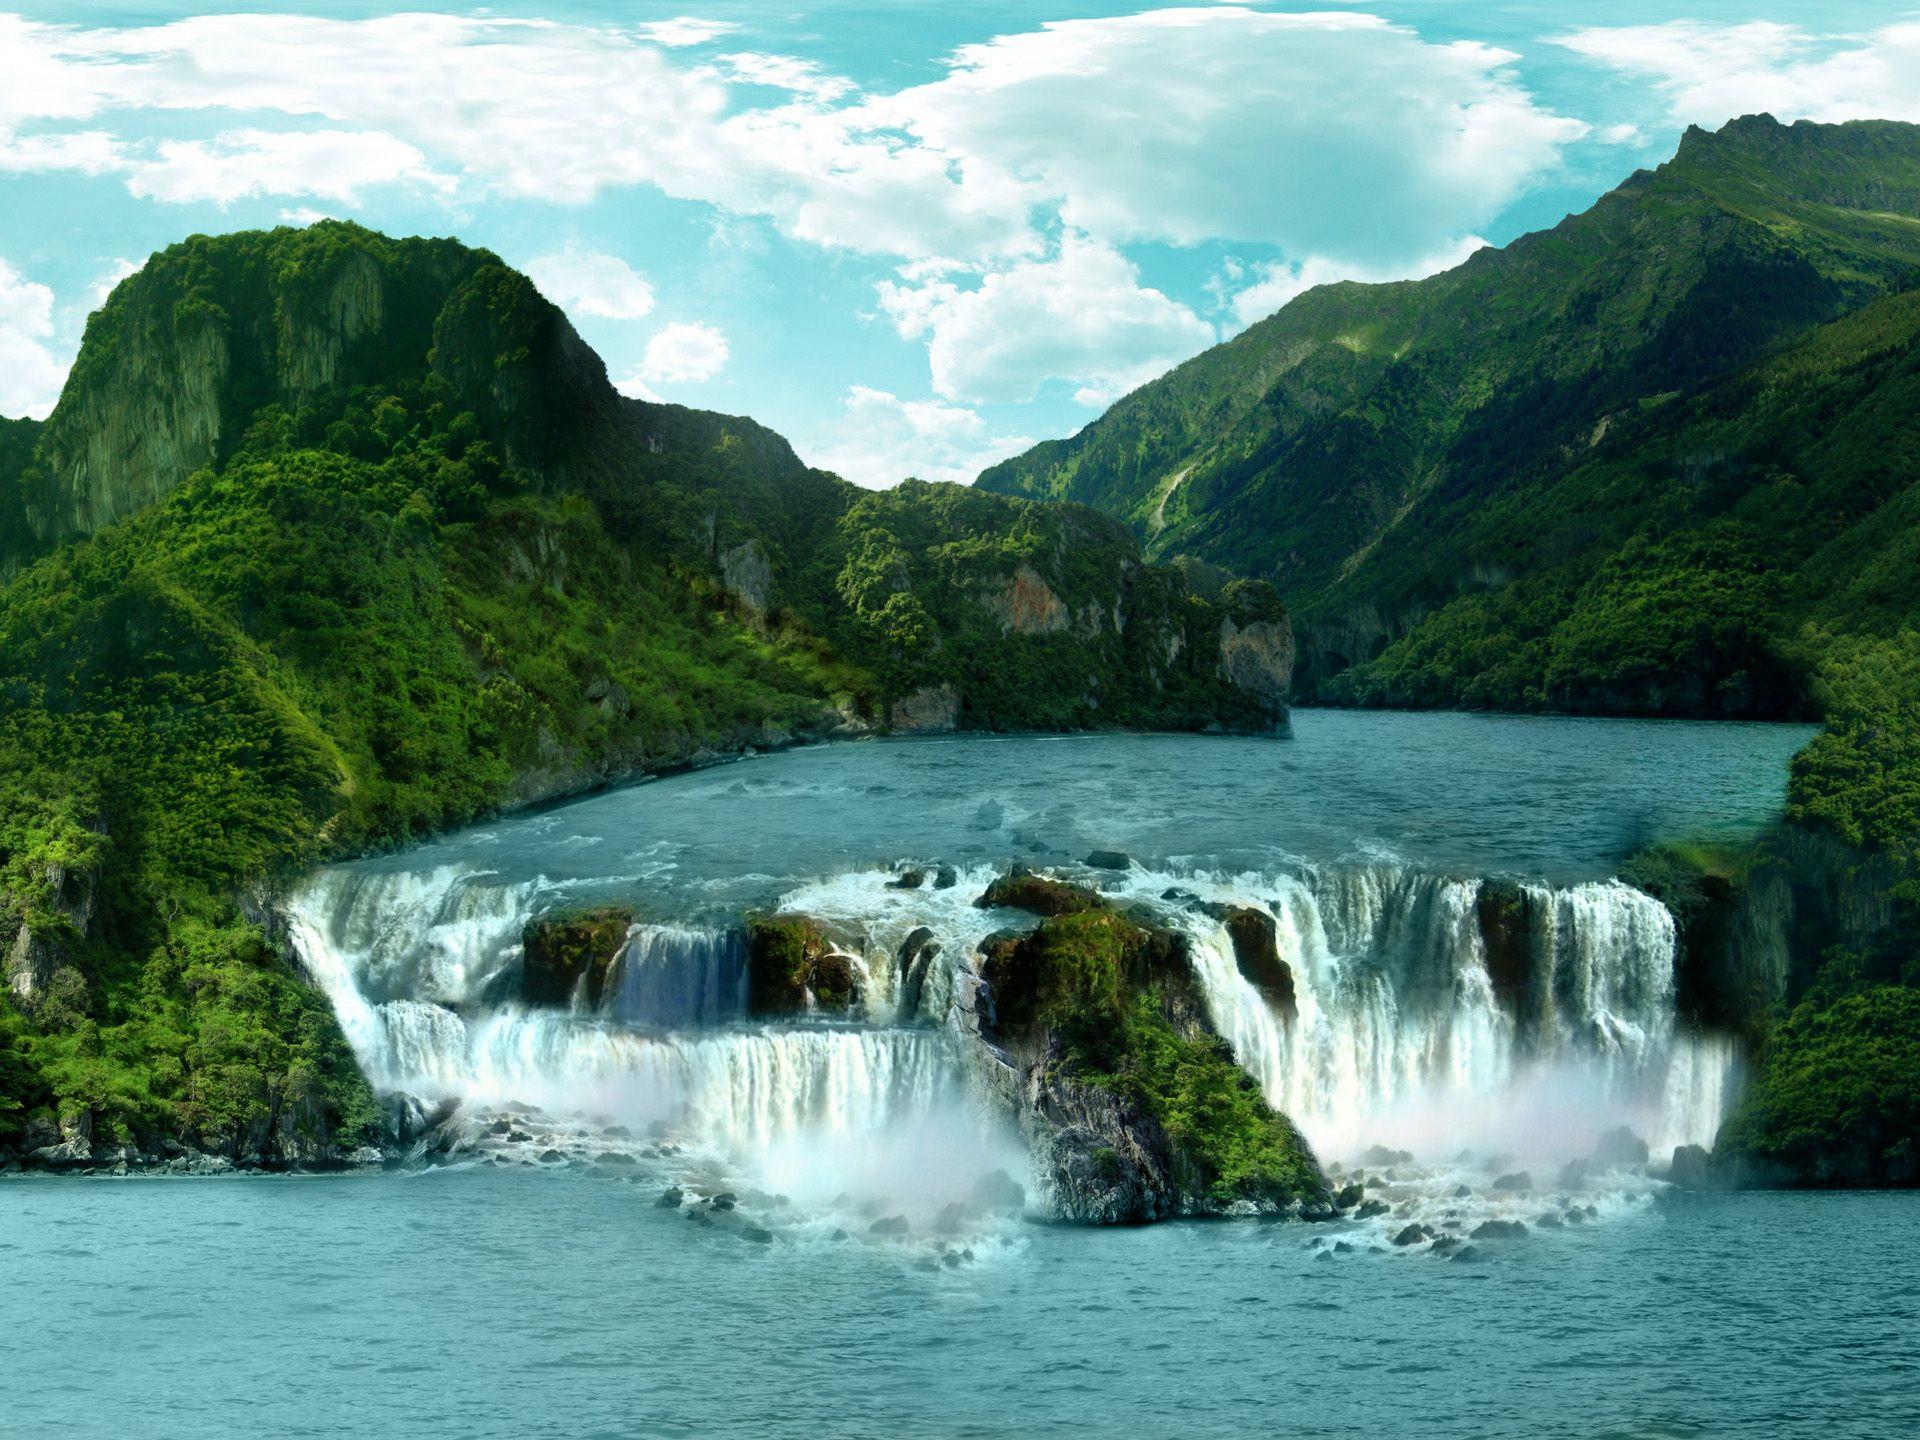 Tropical Scenery Wallpaper